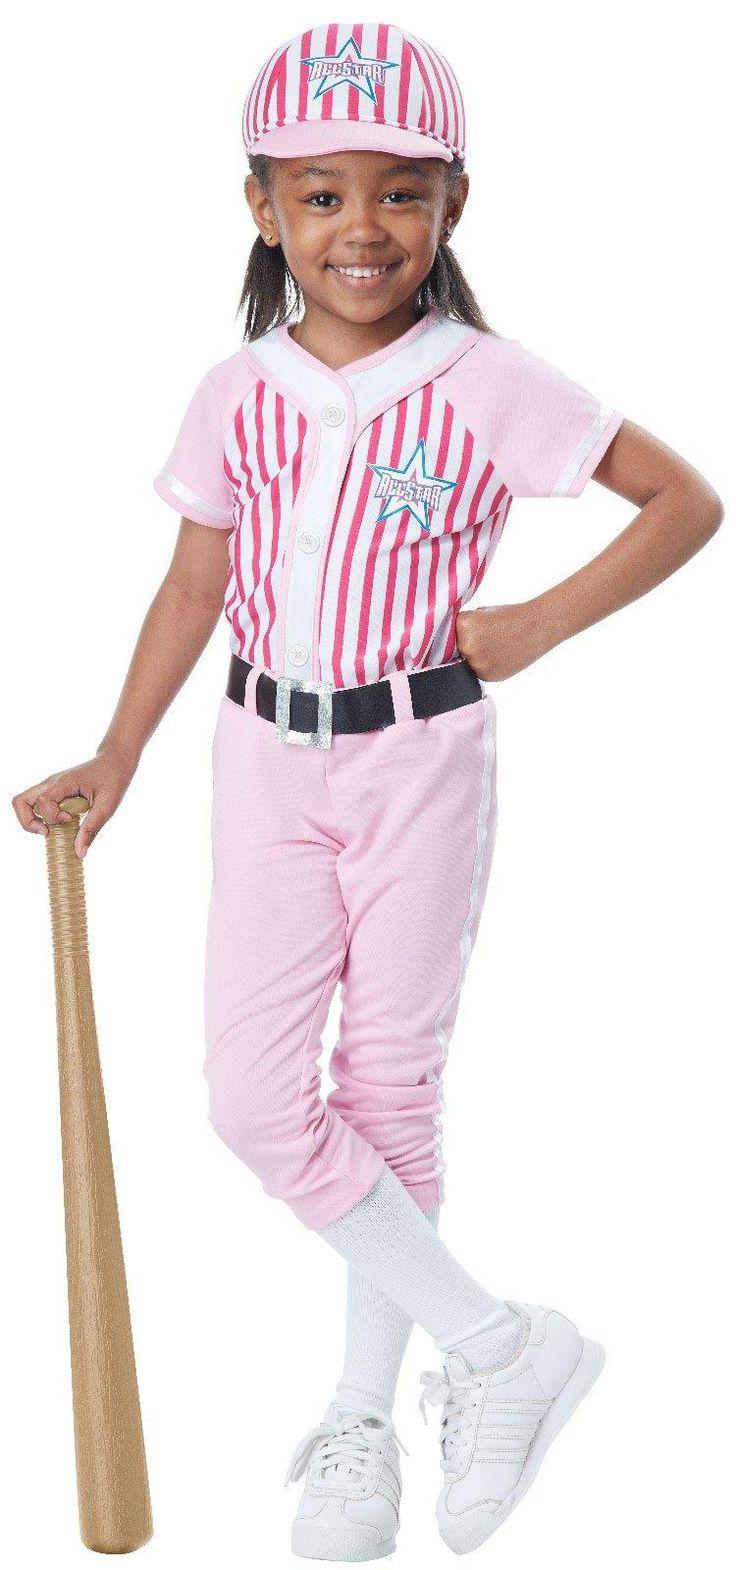 baseball player costume for girls from costumeexpresscom - Baseball Halloween Costume For Girls